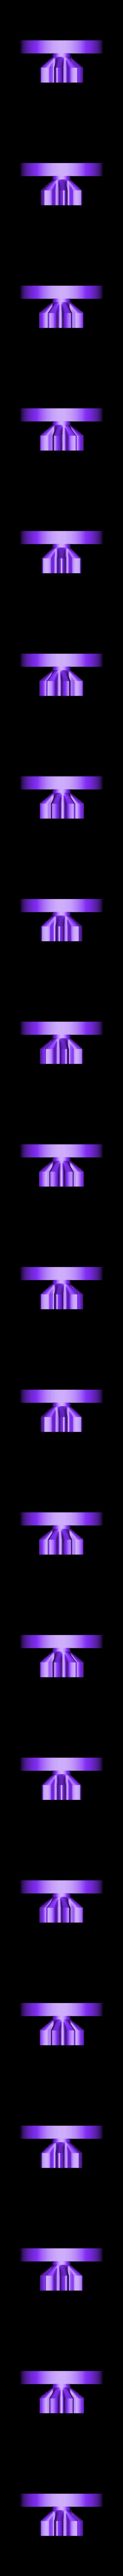 TURNING KNOB (x1).stl Download free STL file Toothpaste Dispenser • 3D print model, Anthony_SA